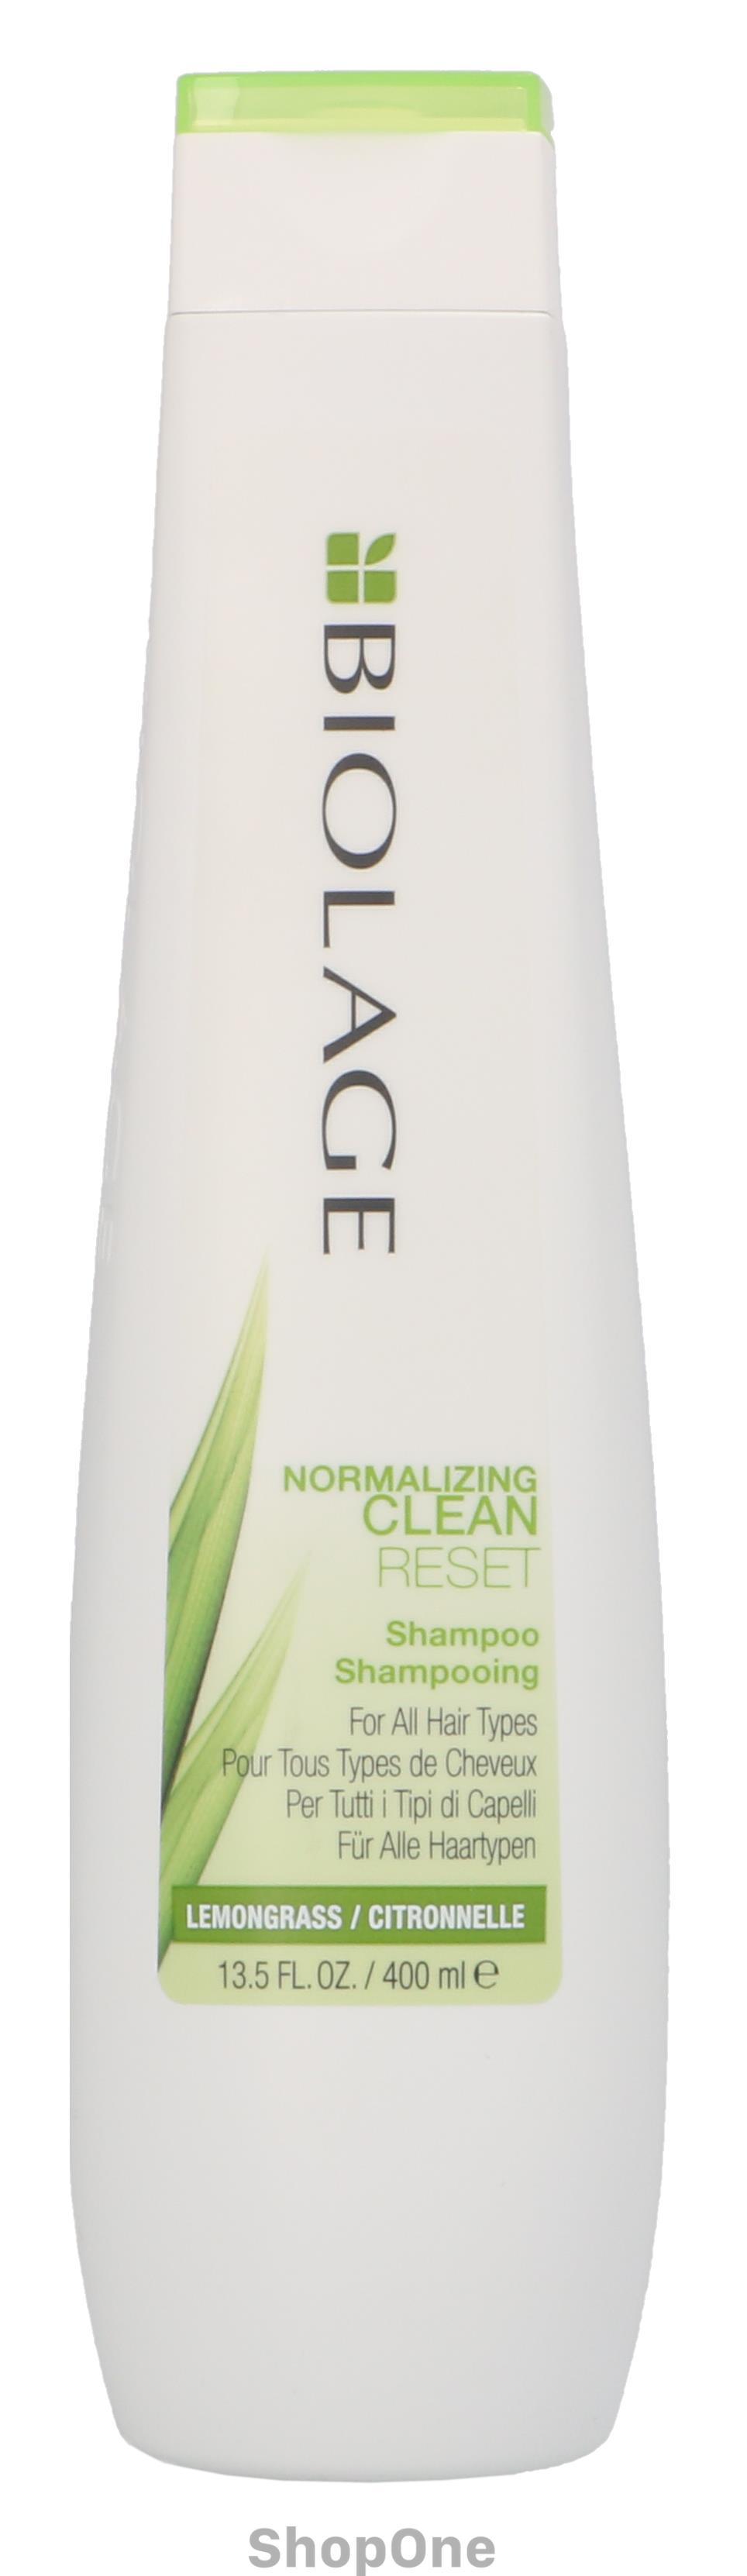 Biolage Normalizing Clean Reset Shampoo 400 ml fra Matrix - Haarverzorging Matrix Biolage Normalizing Clean Reset Shampoo 400 ml. Fra Matrix.